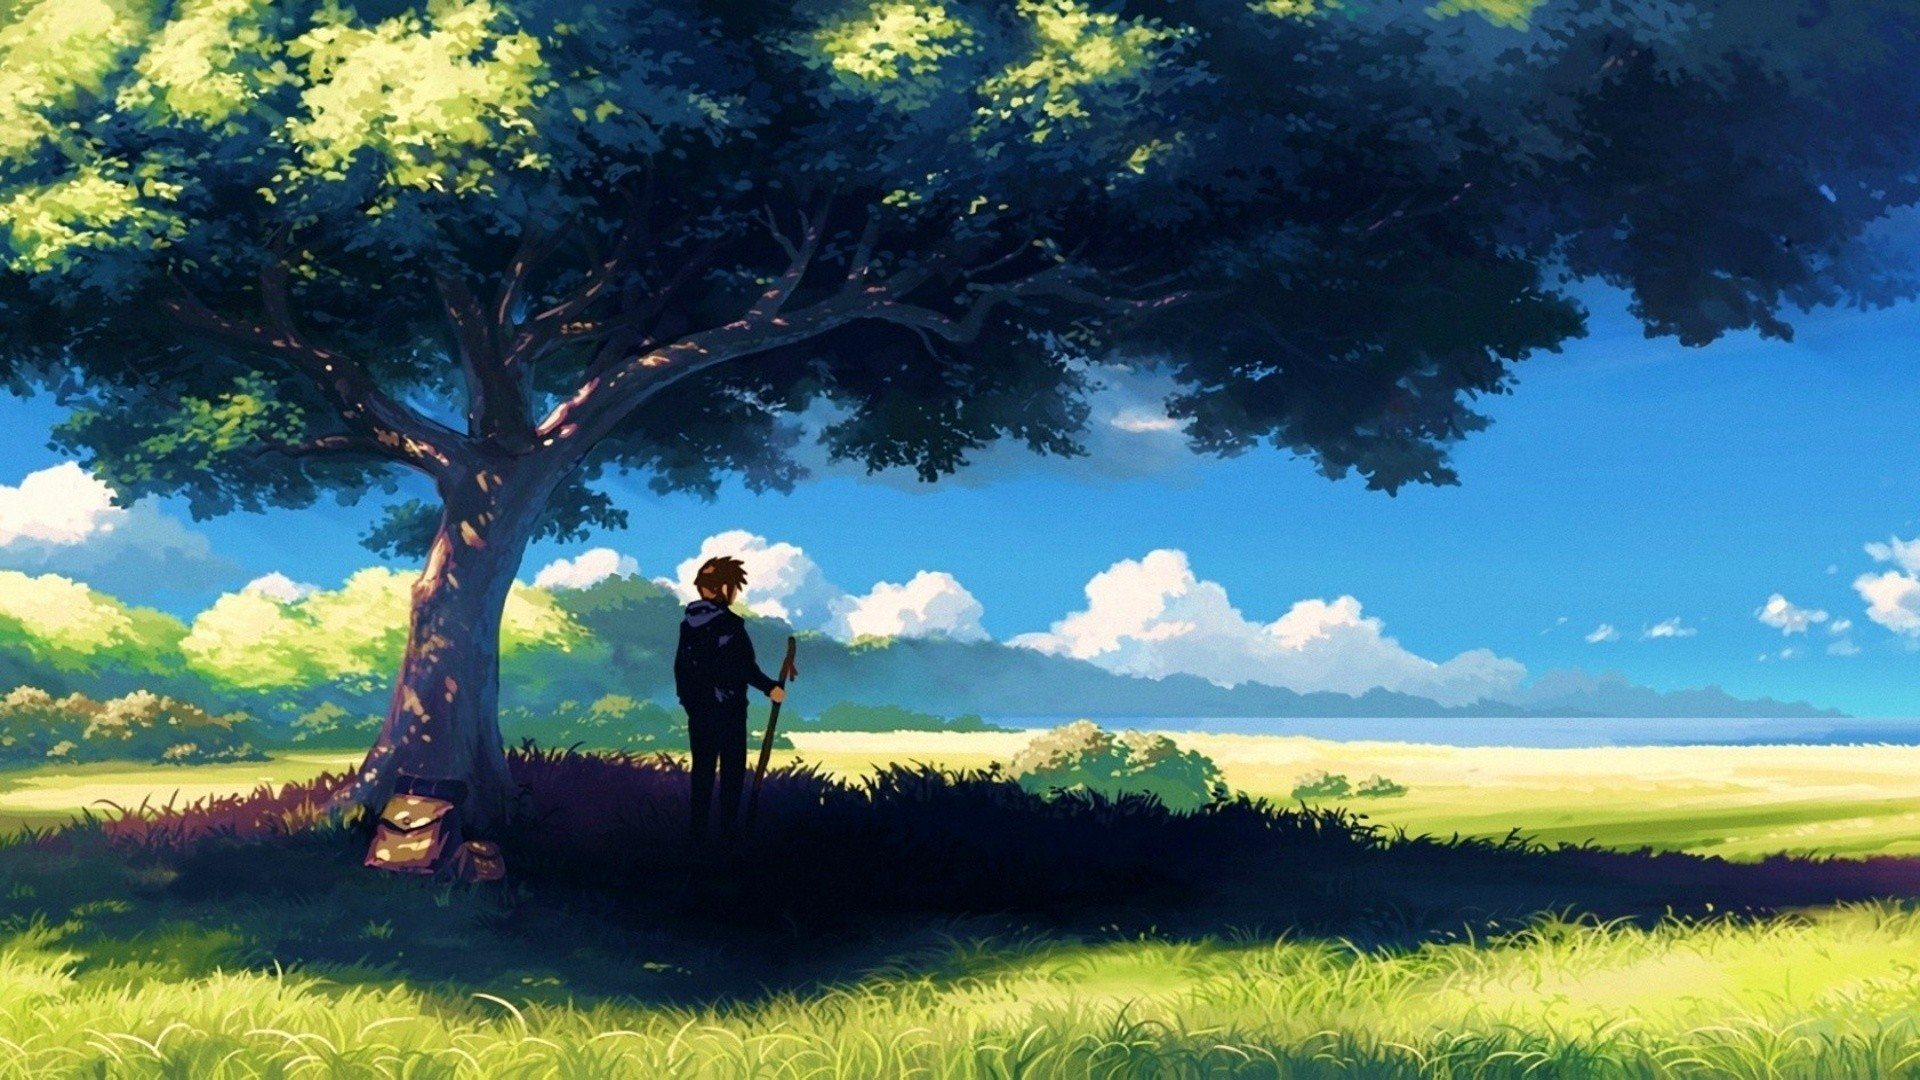 Anime, Scenery, Boy Under Tree, Anime Scenery Wallpapers .